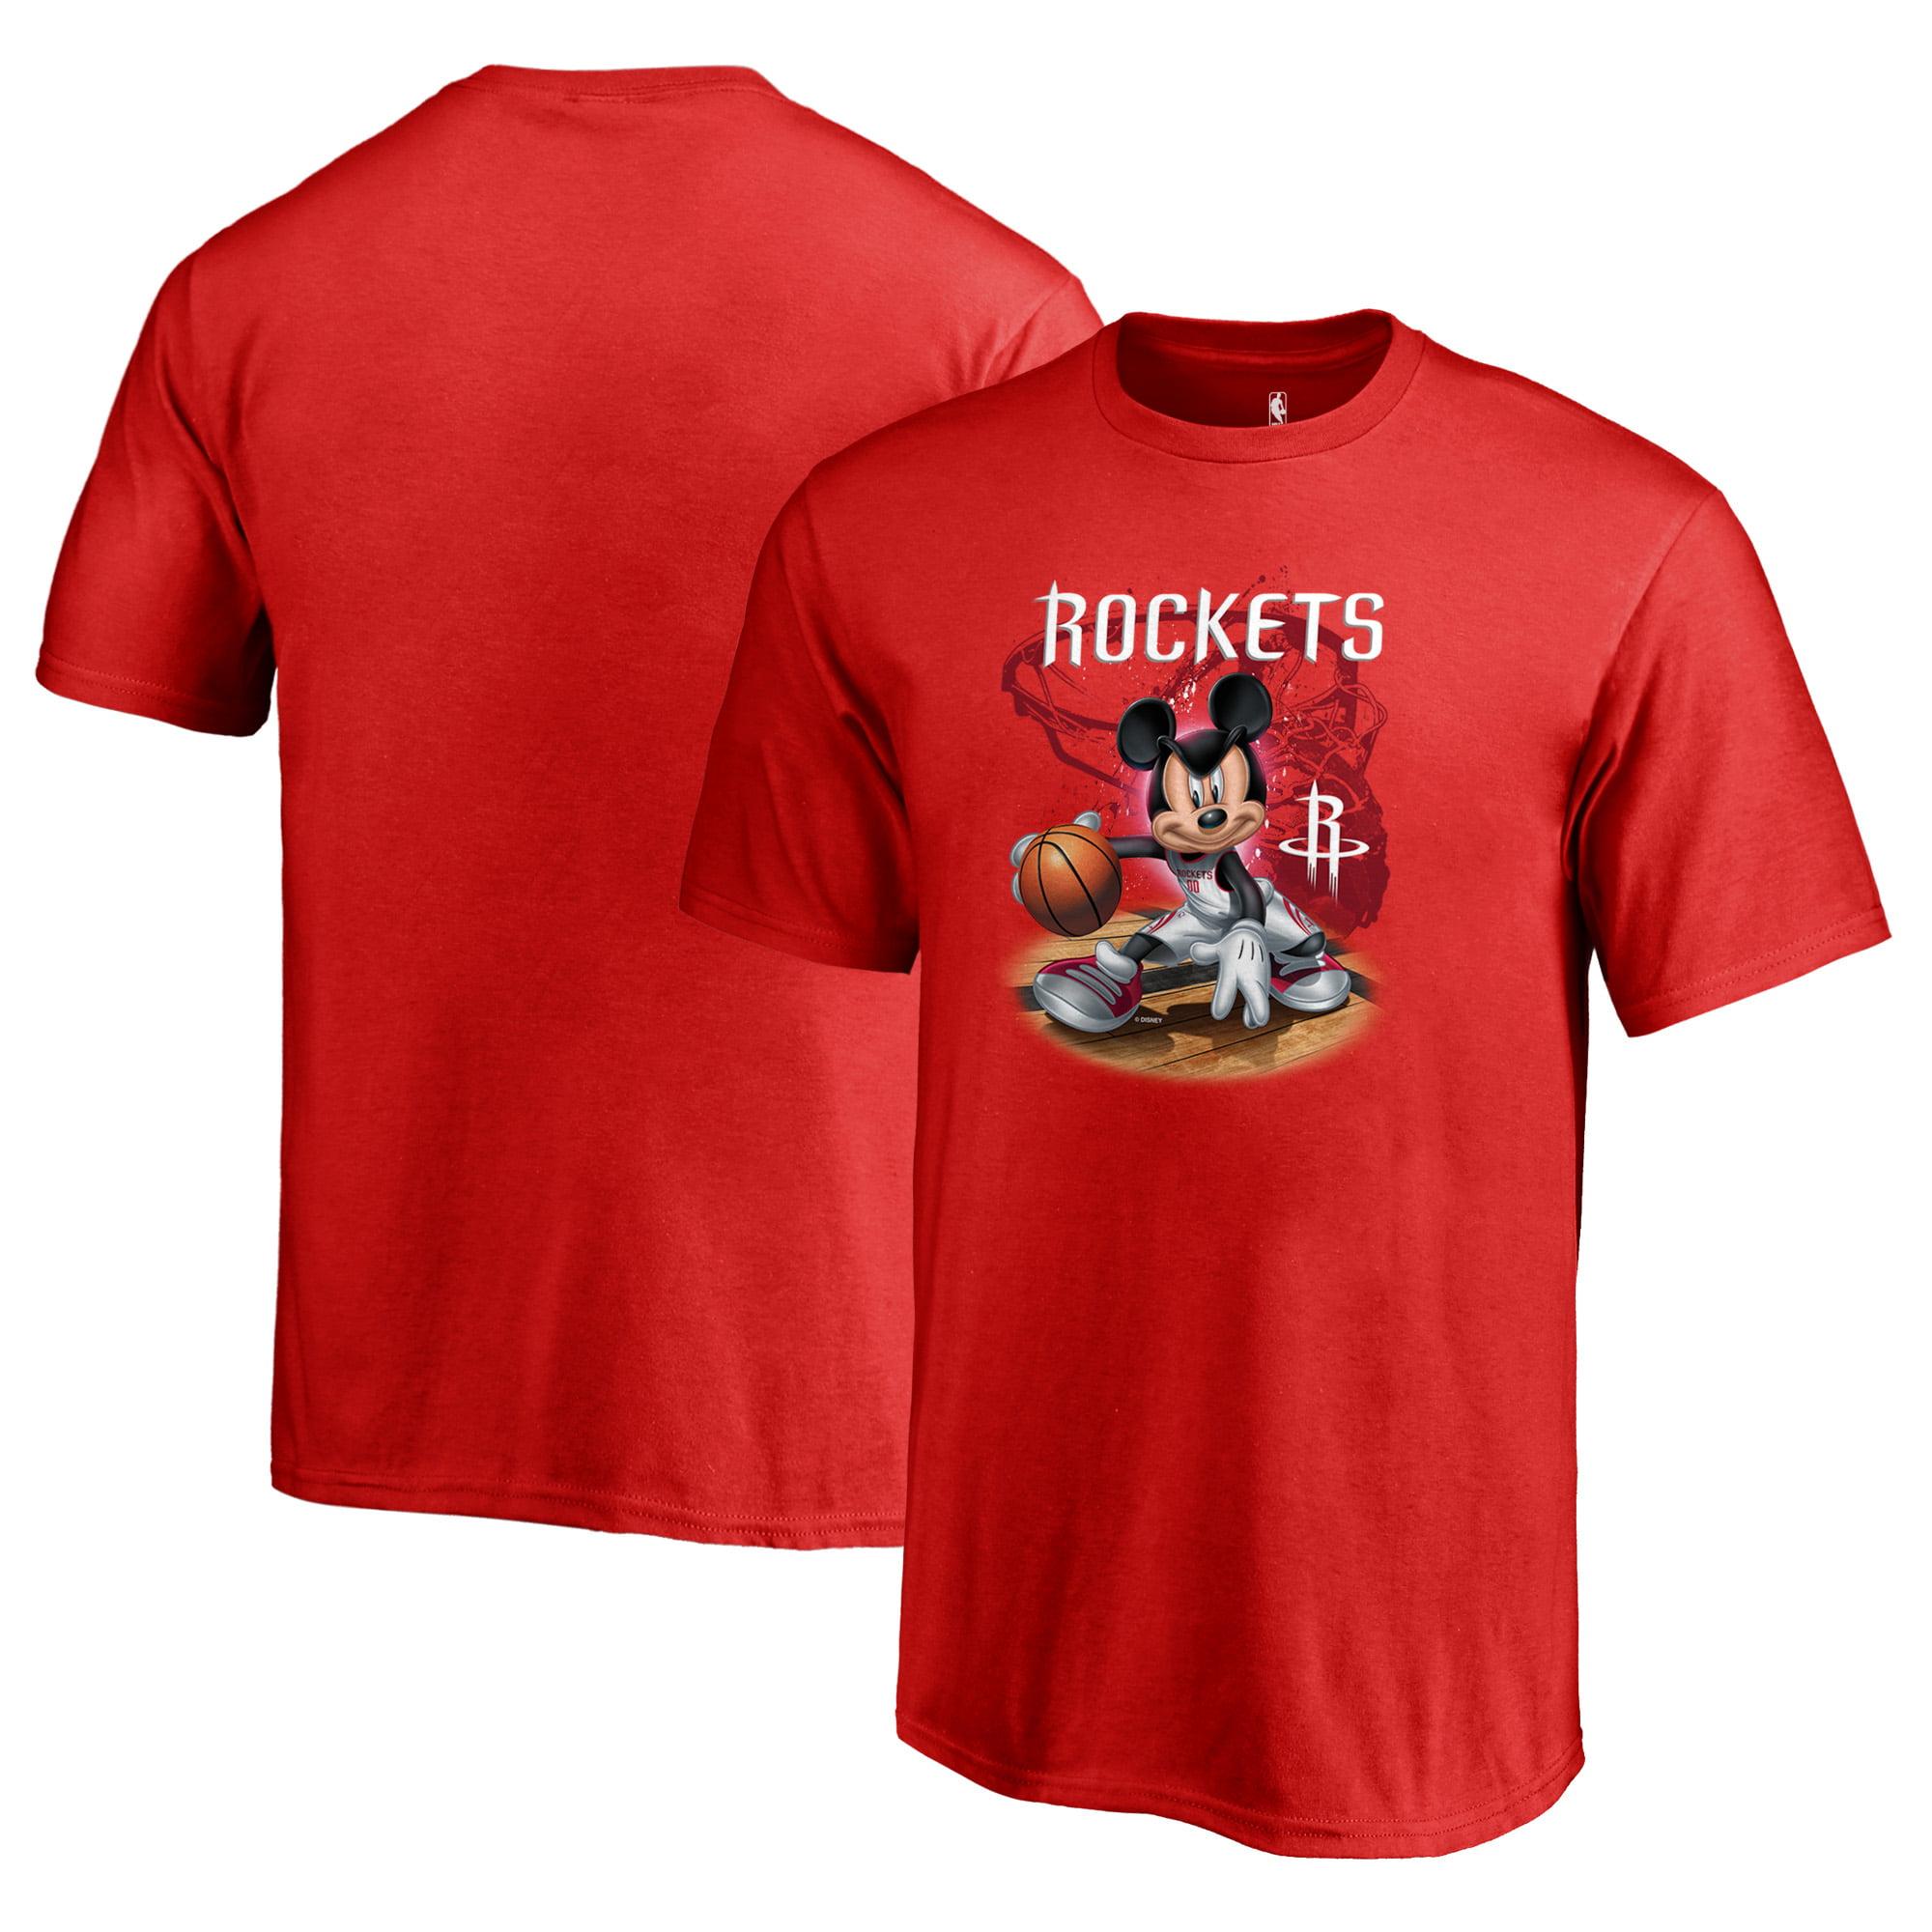 Houston Rockets Fanatics Branded Youth Disney NBA All-Star T-Shirt - Red